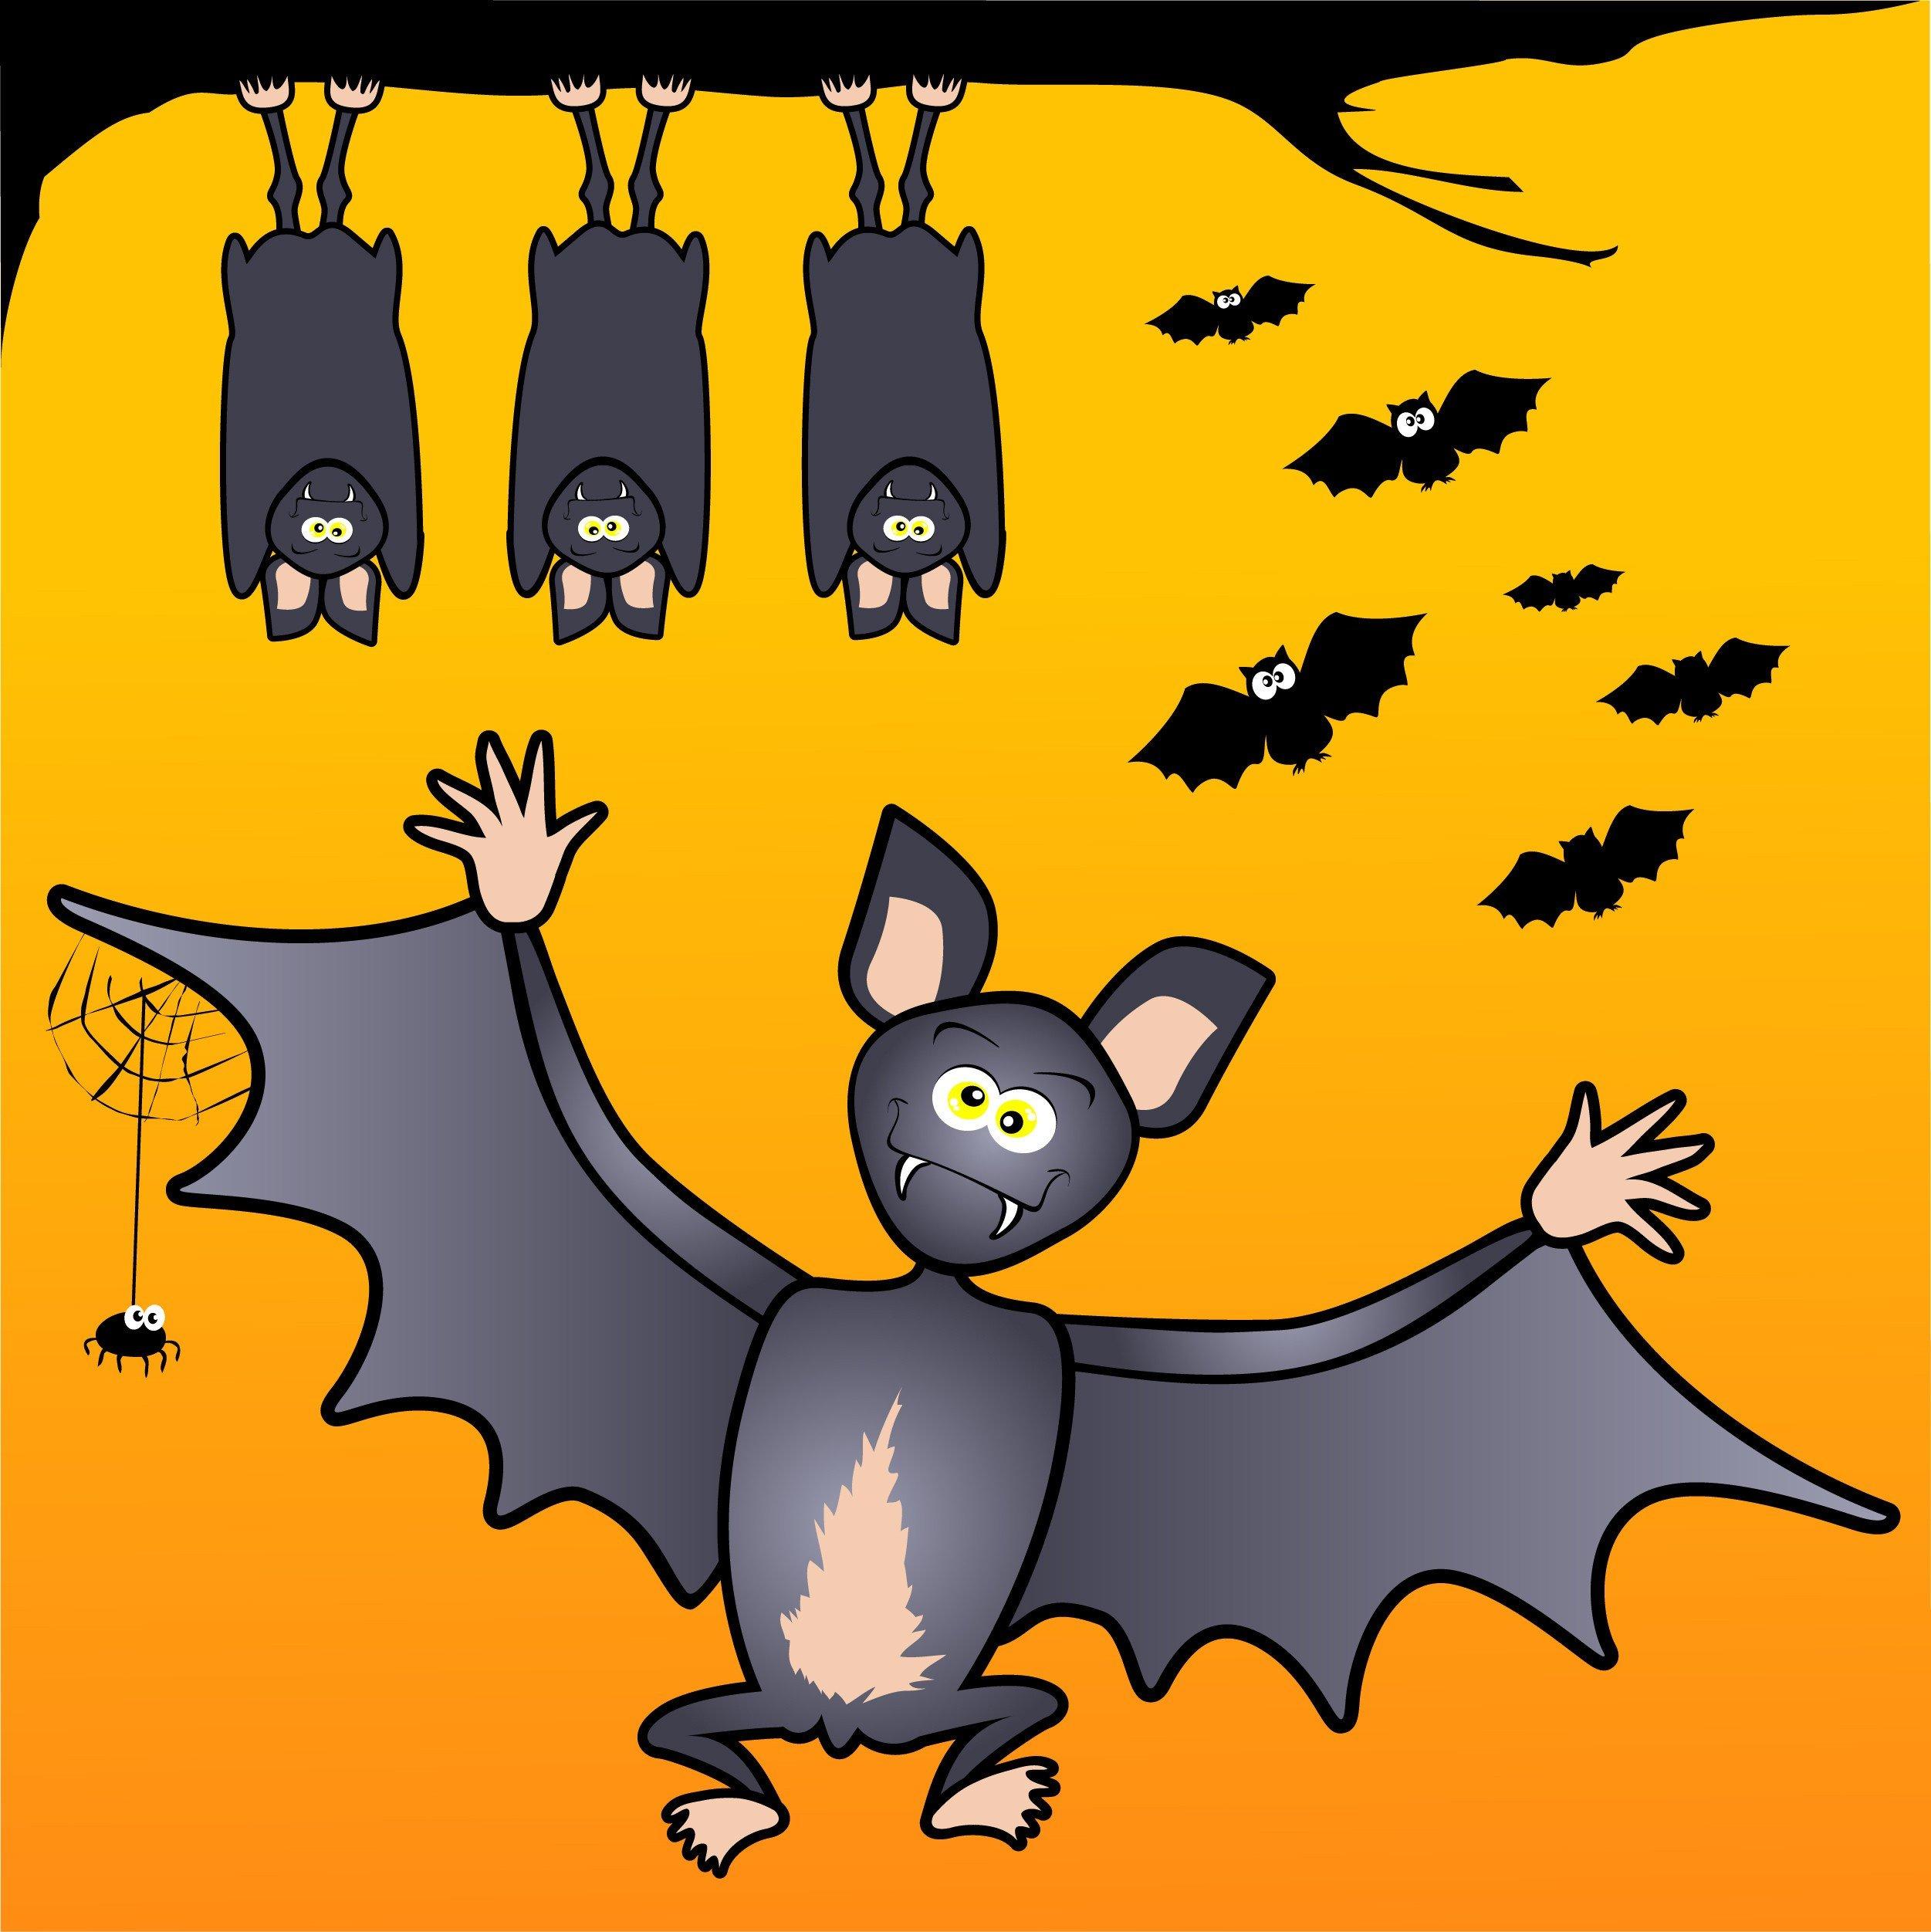 Series of funny bats on orange background.